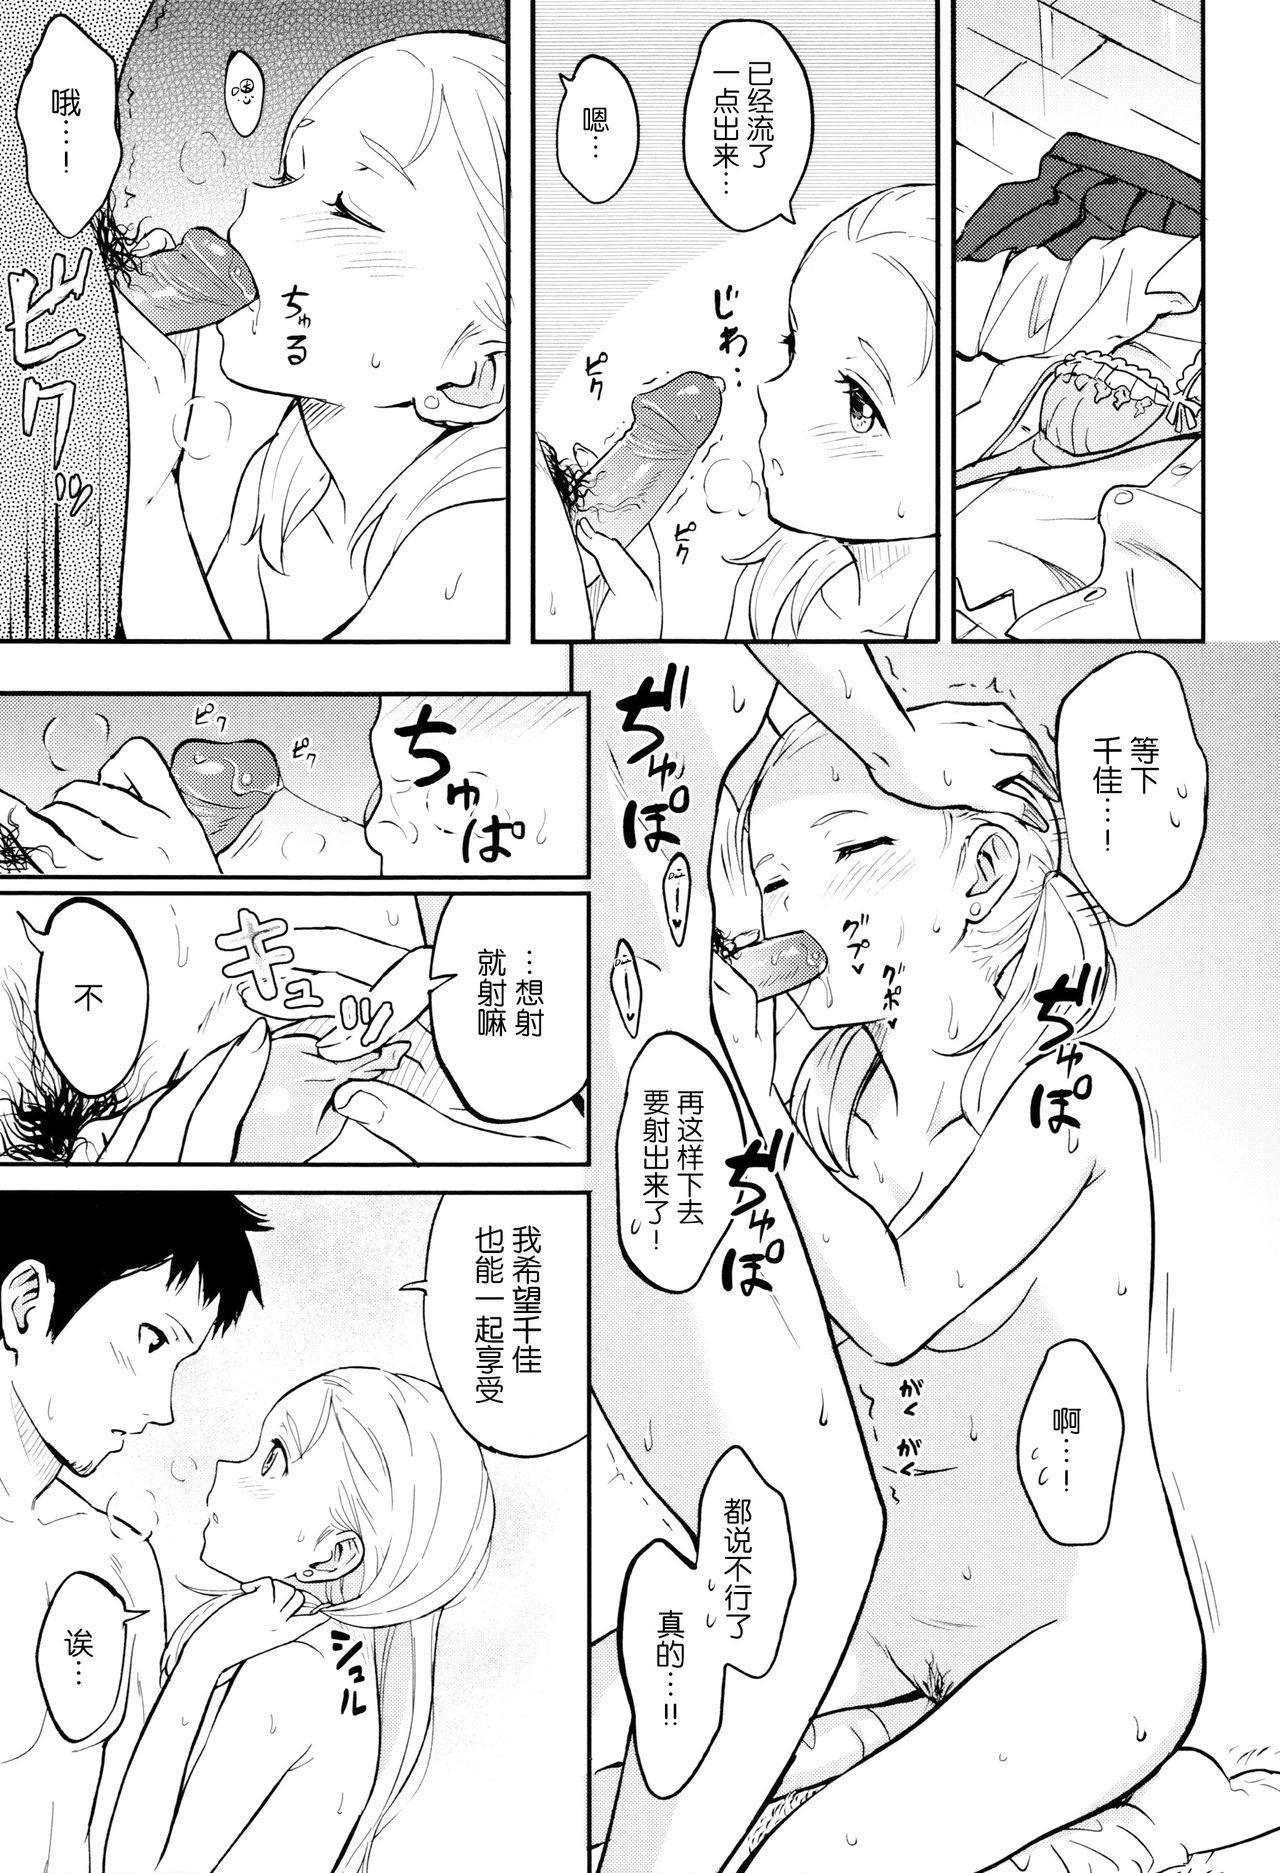 Tokubetsu na Mainichi - Special daily 83